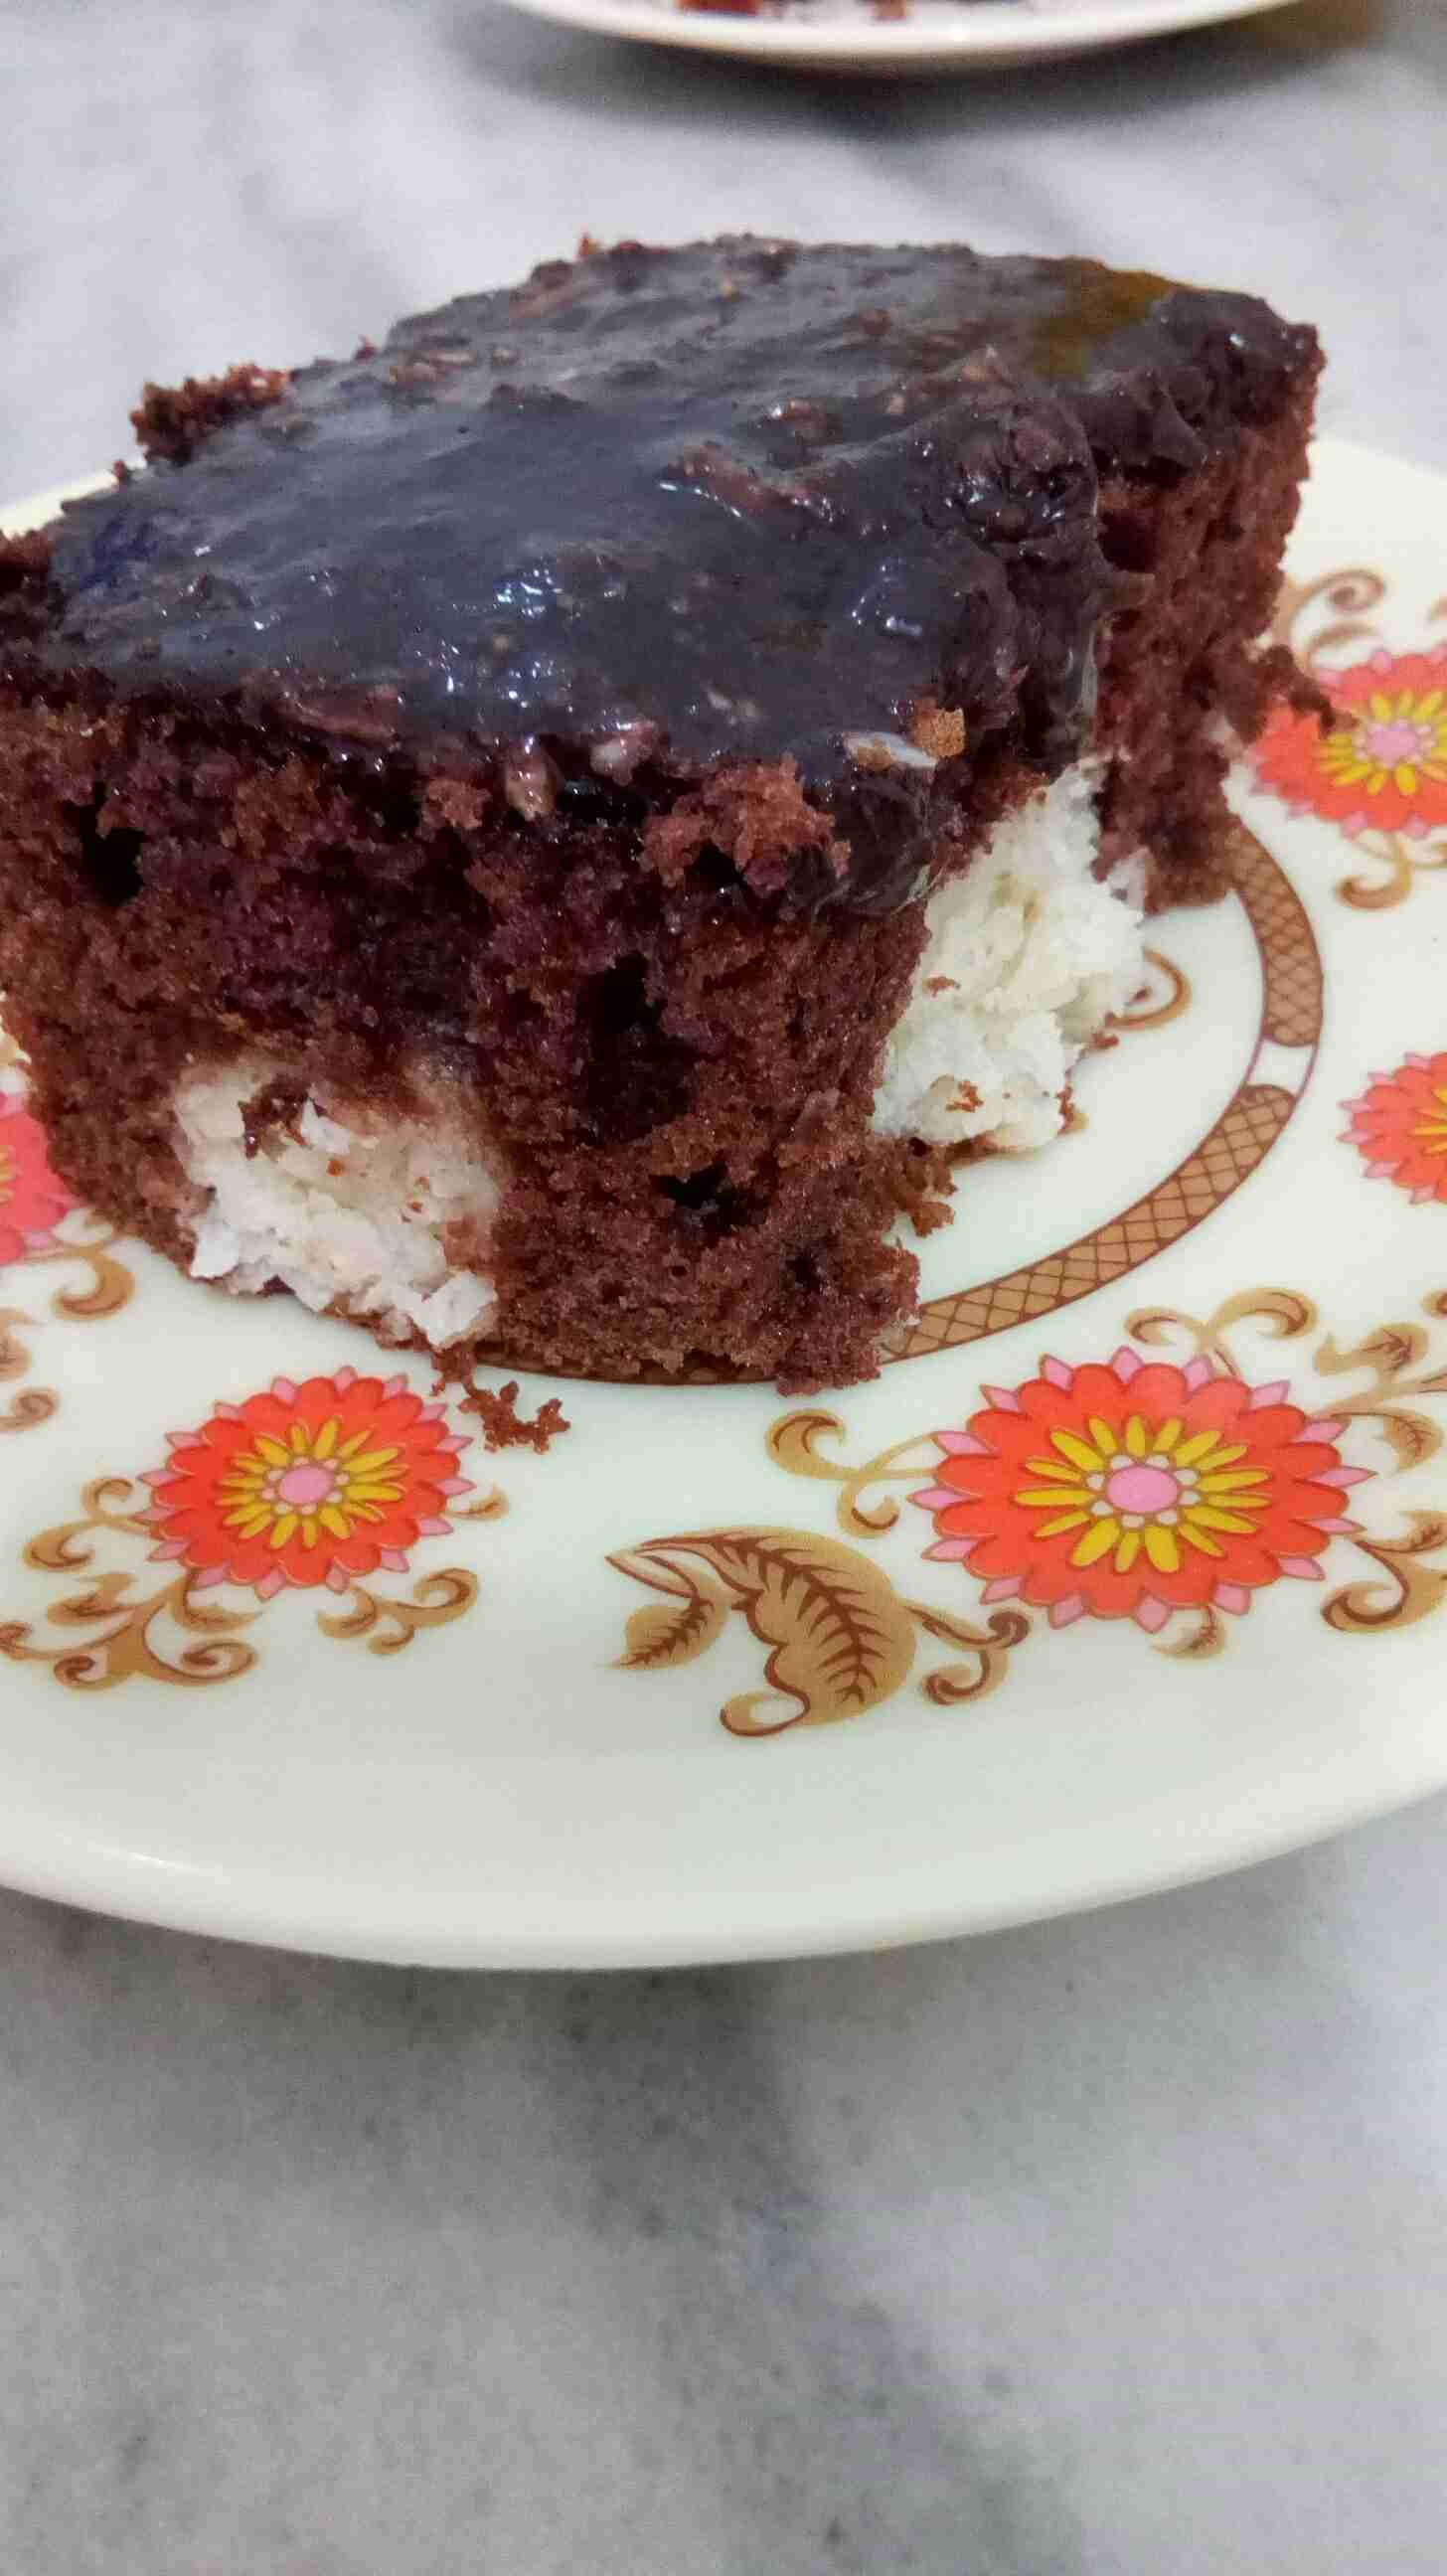 كيكة بكرات جوز الهند زاكي Recipe Food Cake Chicken Comfort